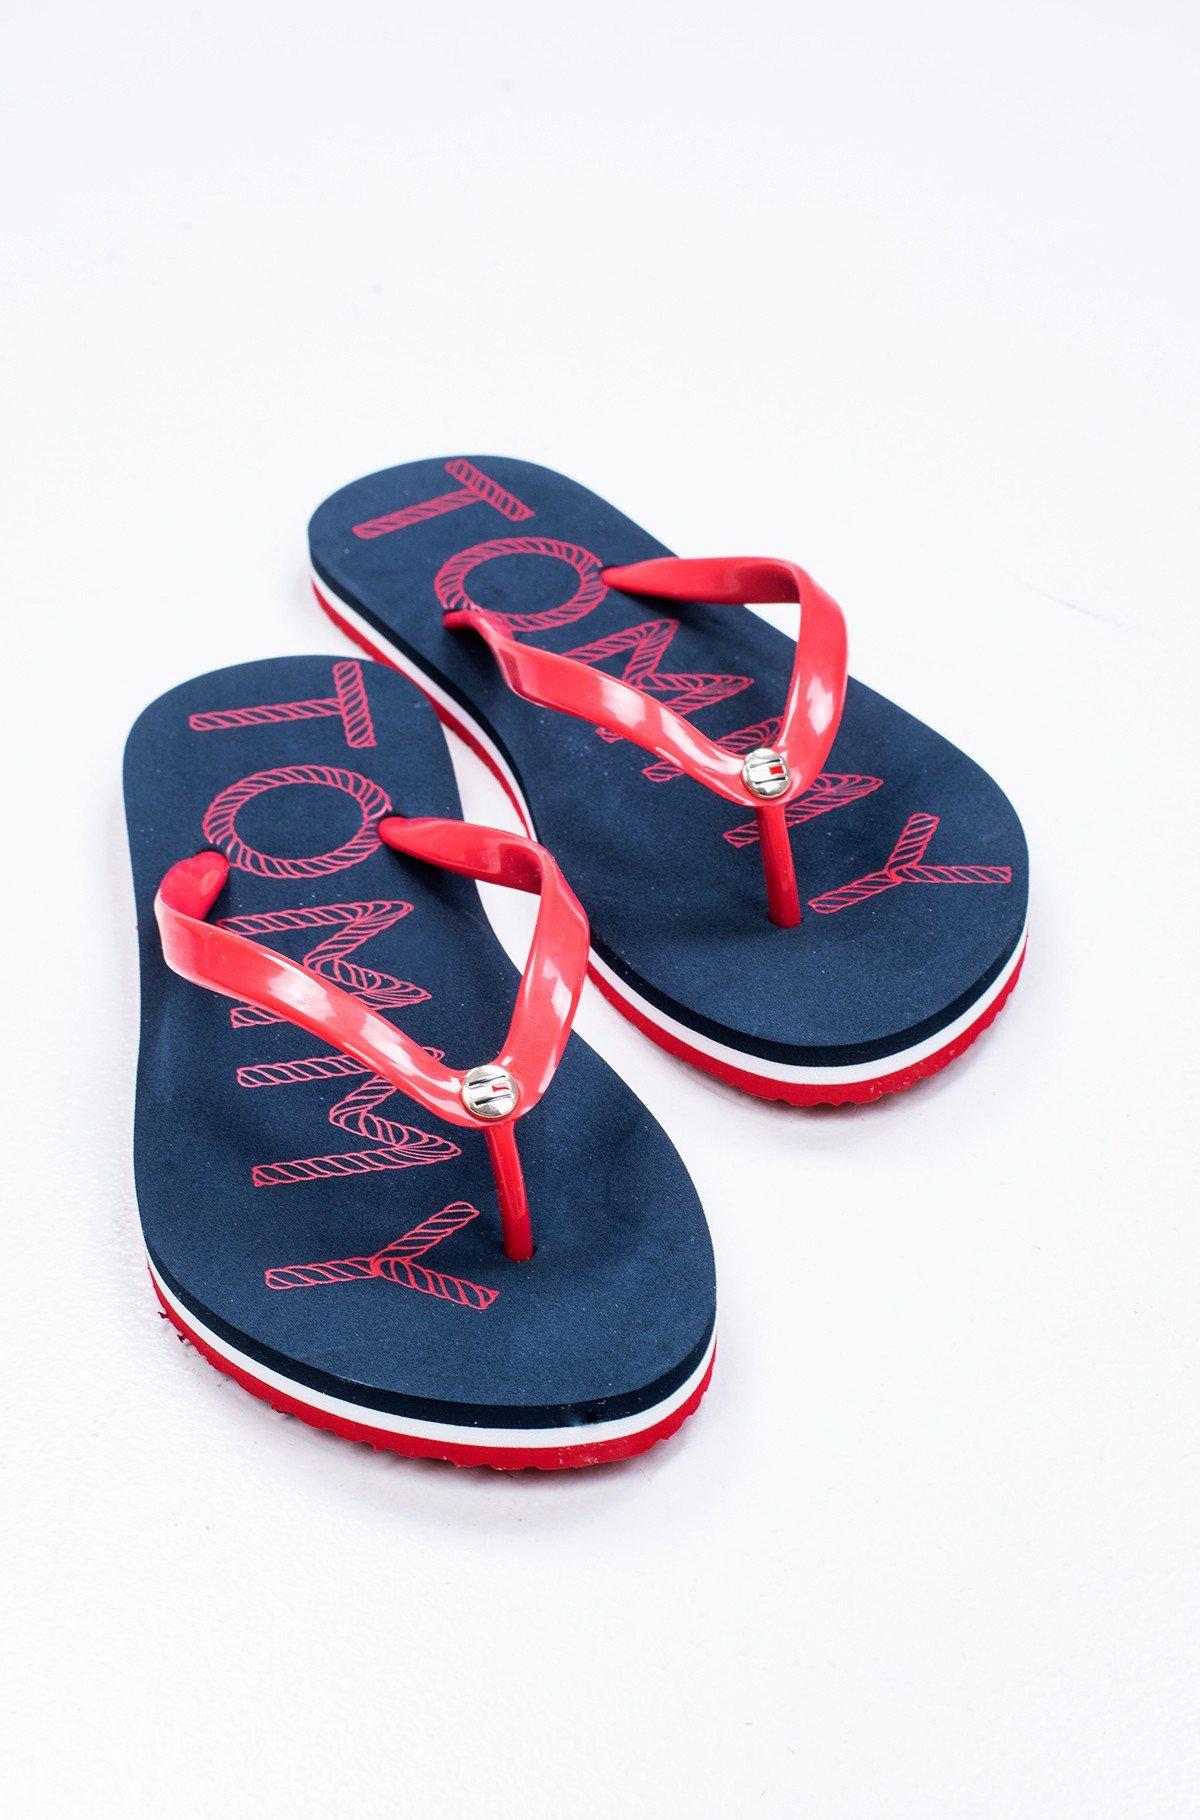 Flip-flops TOMMY FOOTBED FLAT BEACH SANDAL-full-1